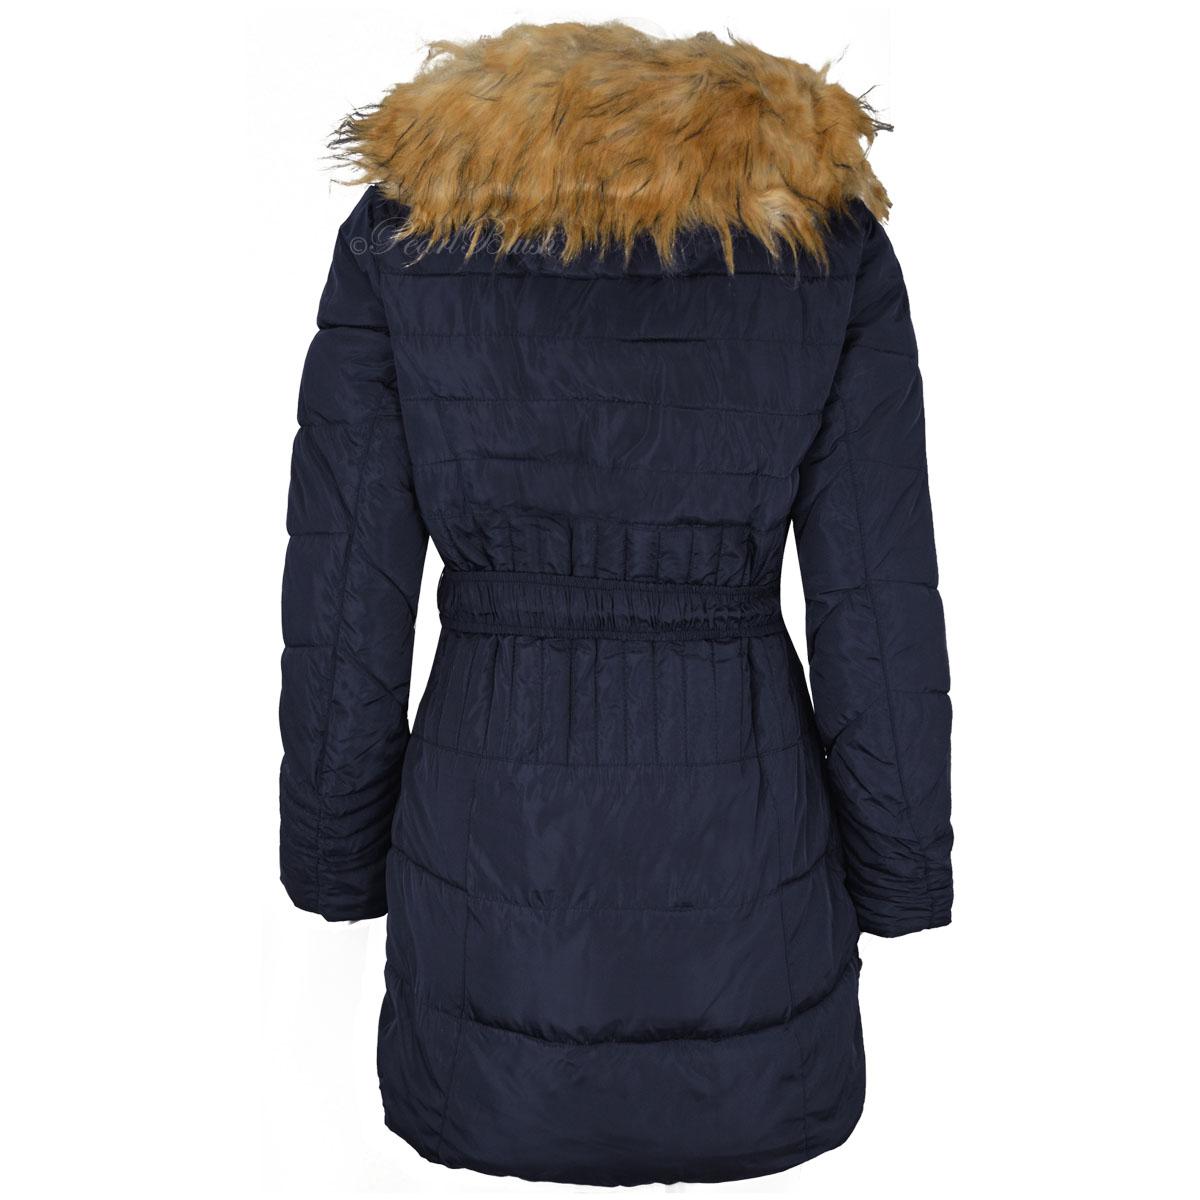 Womens winter coats australia